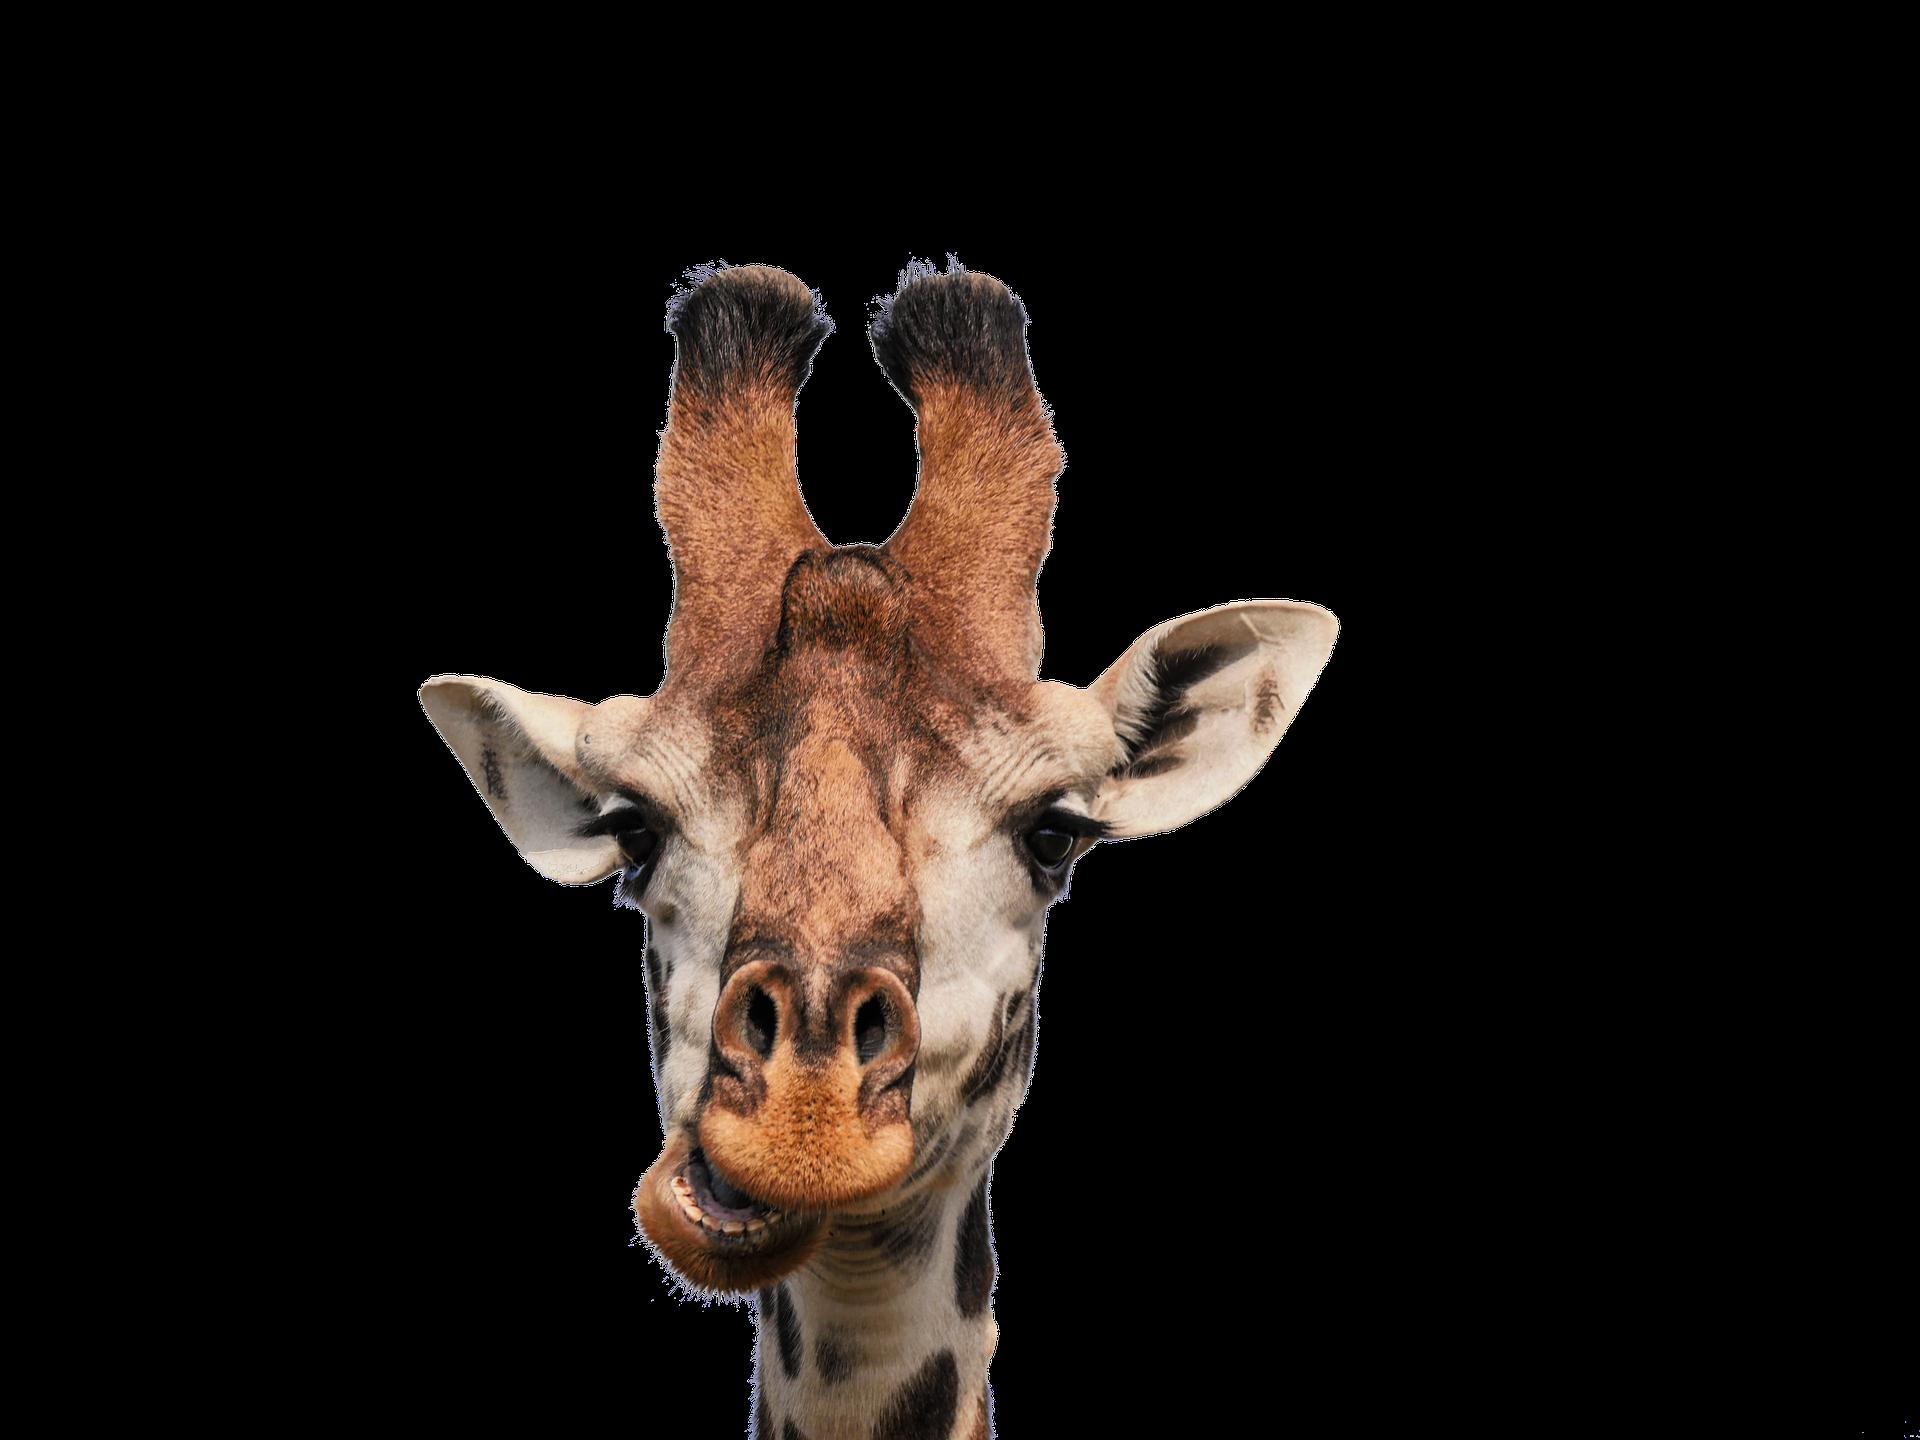 giraffe cyberformation